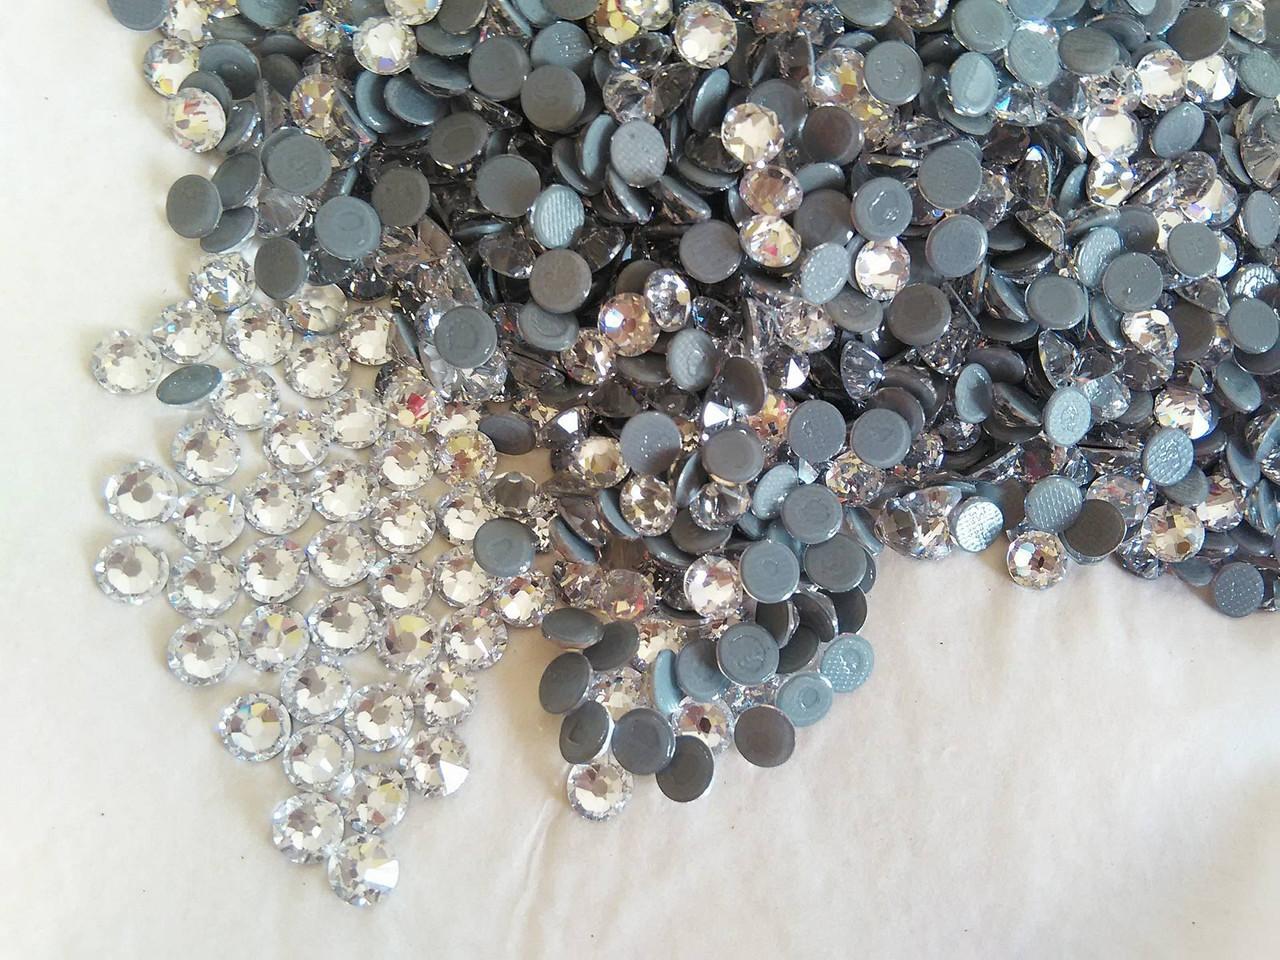 Термо-стразы ss20 Crystal, Xirius 16 граней, 1440шт. (4,6-4,8мм)